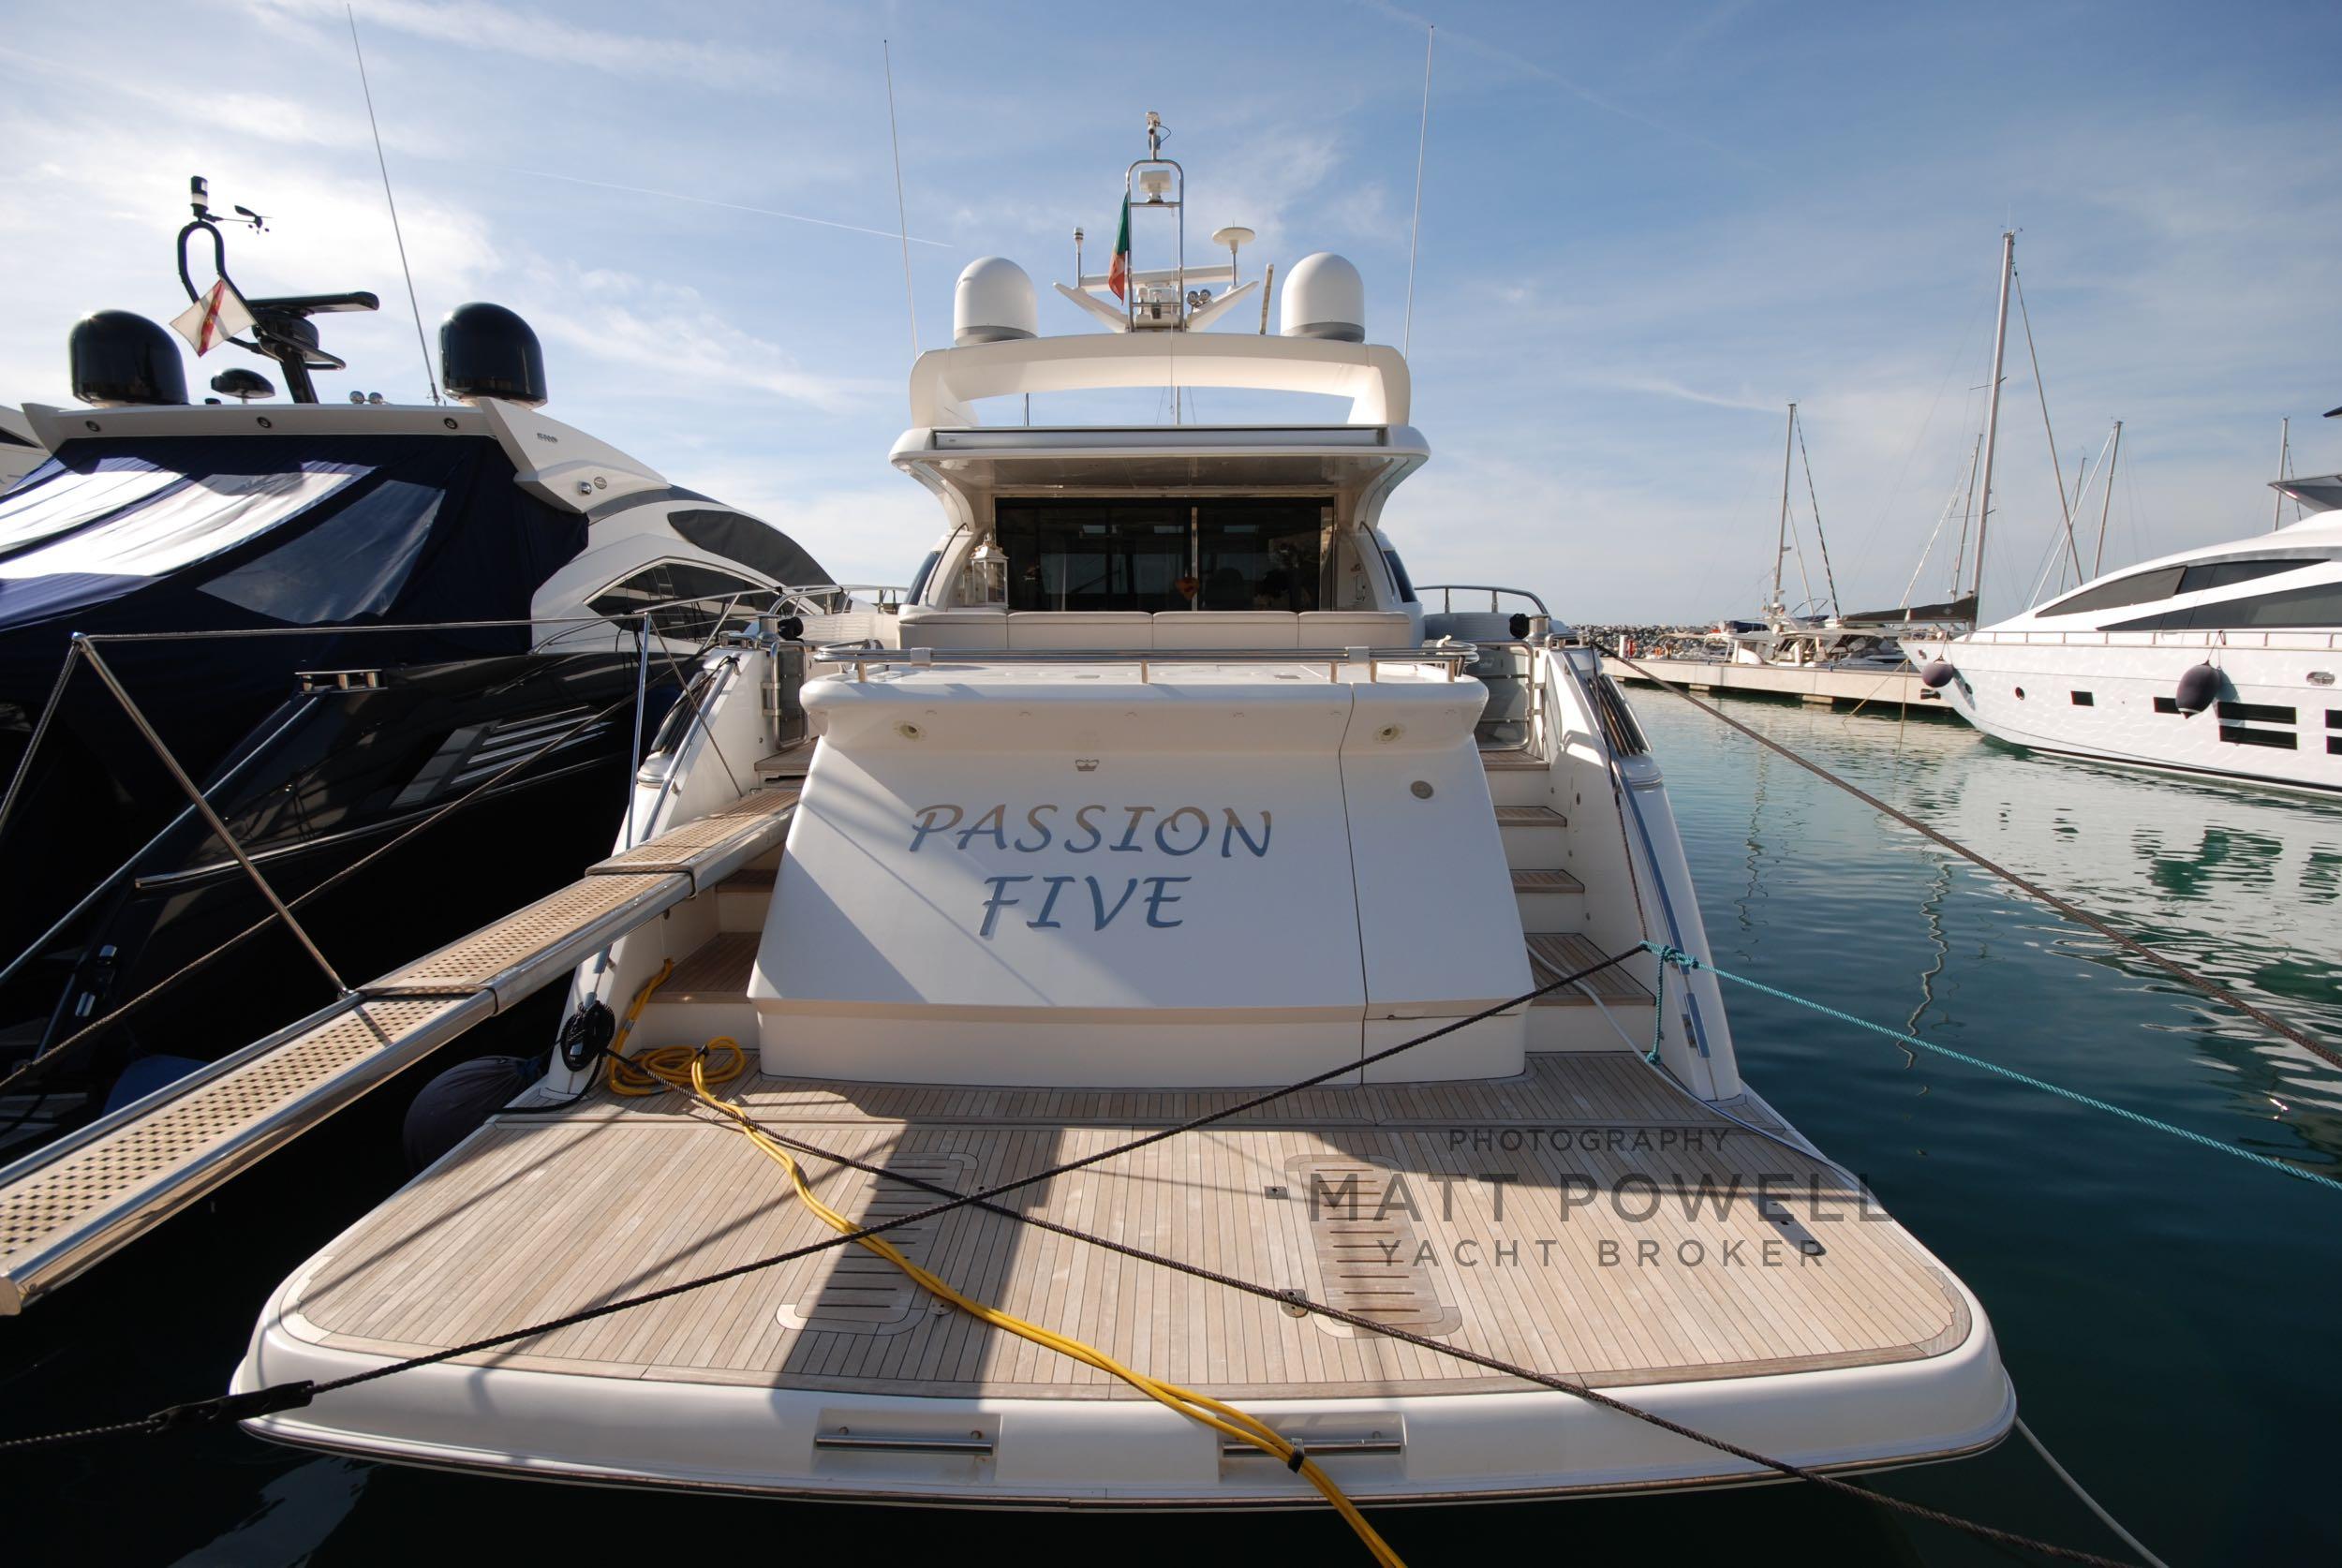 princess-v78-passion-five-for-sale-matt-powell-broker 002.jpg